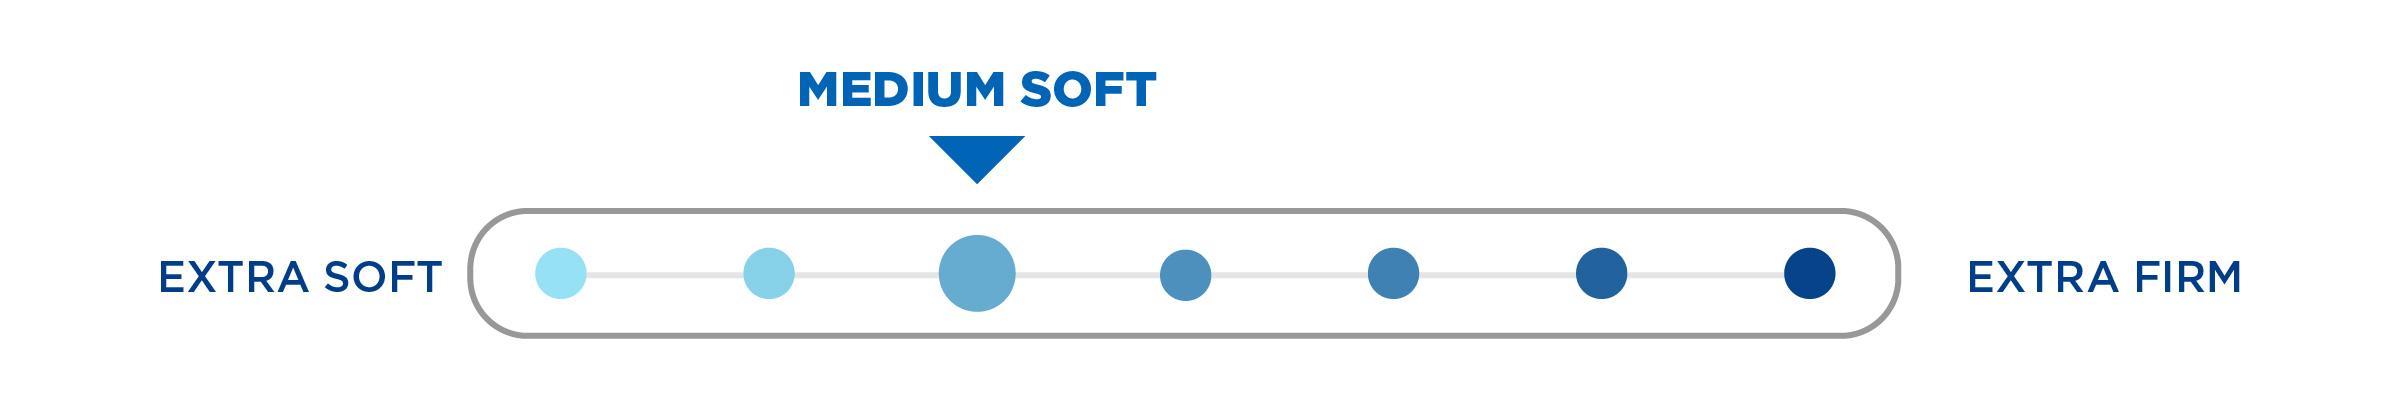 escape 700 mattress comfort scale medium soft